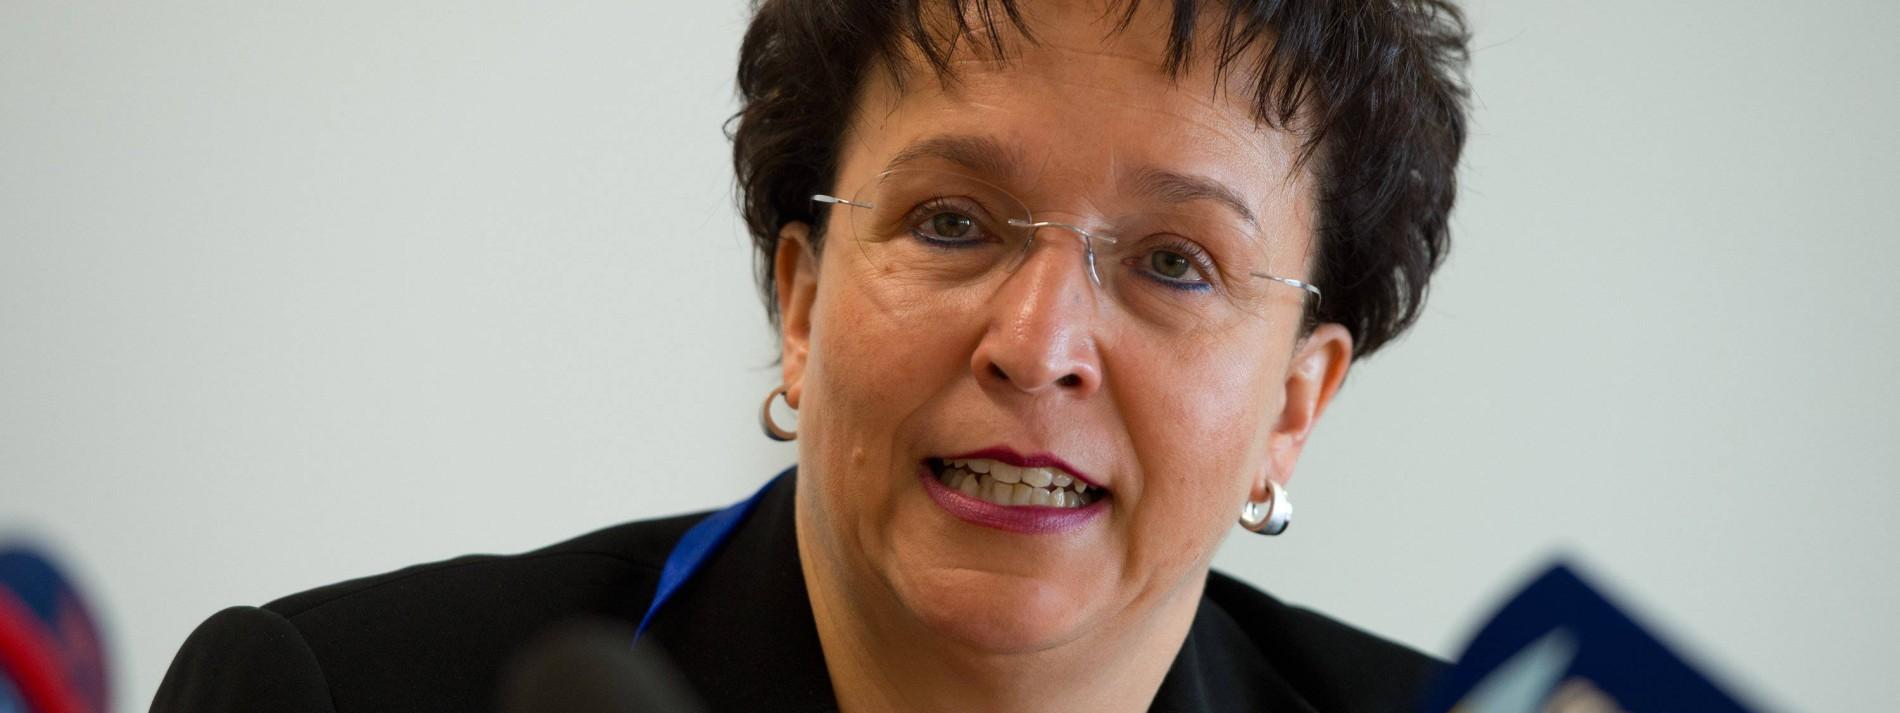 Birgit Homburger übernimmt Leitung des DAI-Hauptstadtbüros